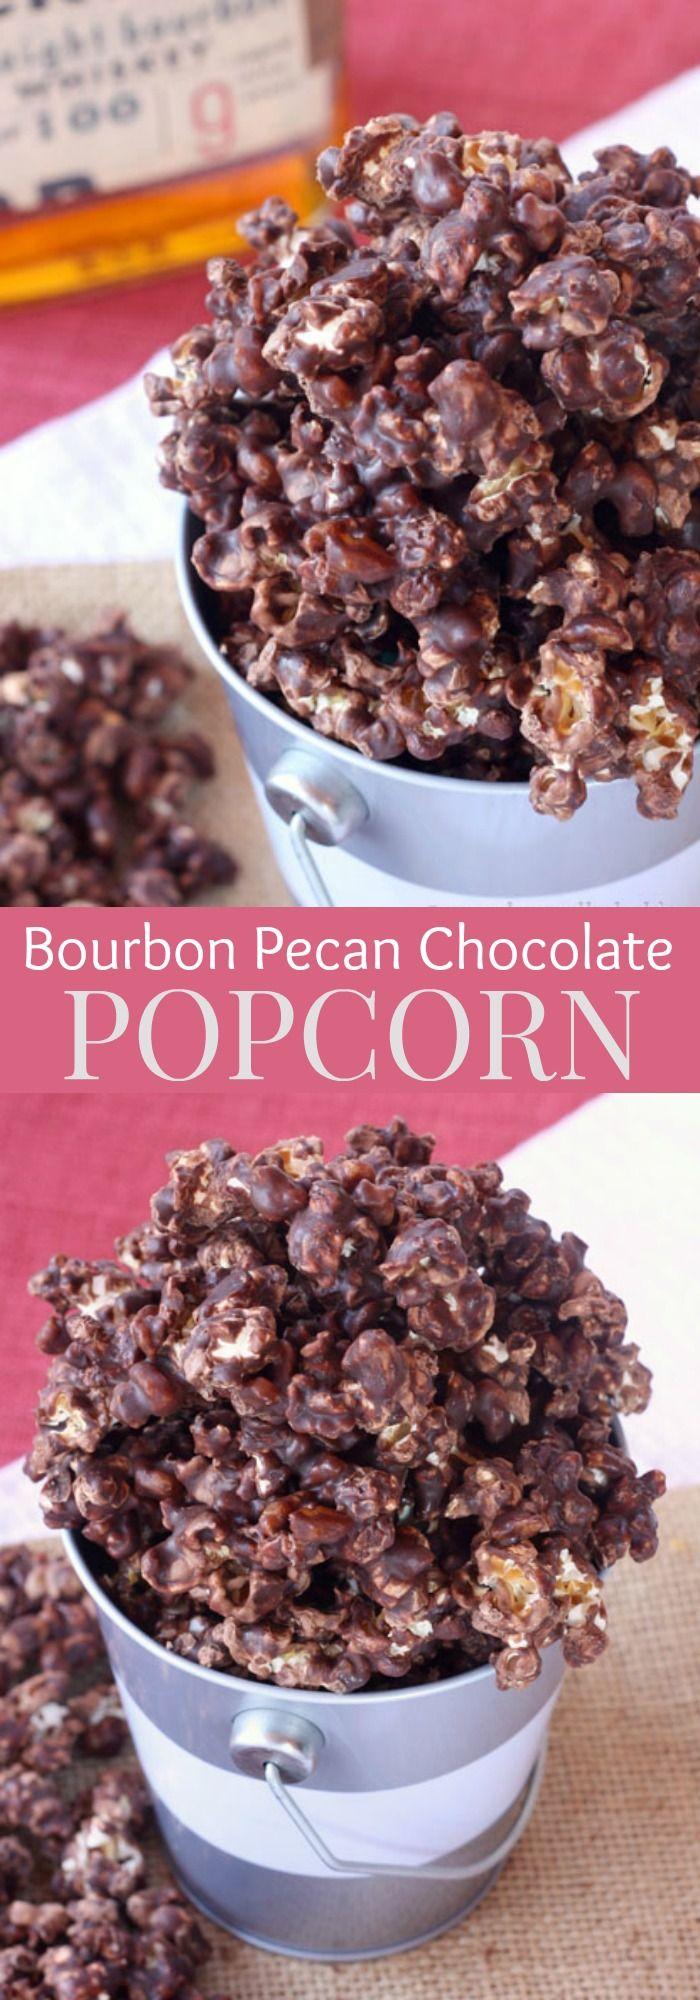 Bourbon Pecan Chocolate Popcorn - a decadent, chocolaty, boozy snack! | cupcakesandkalechips.com